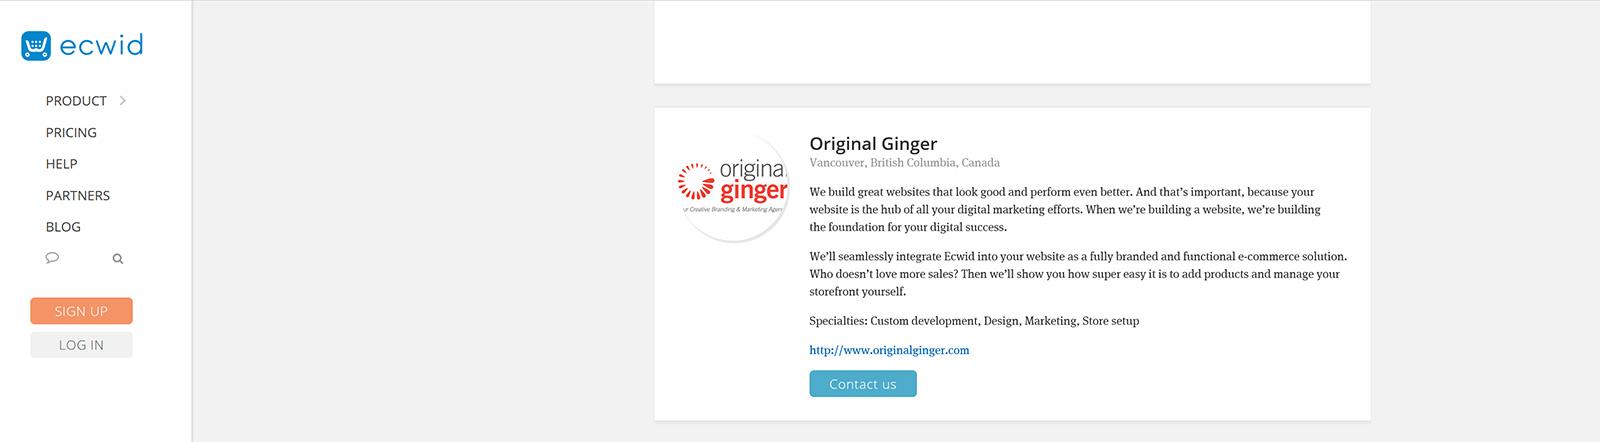 Go To Ecwid Shopping Cart Integration Experts | Original Ginger